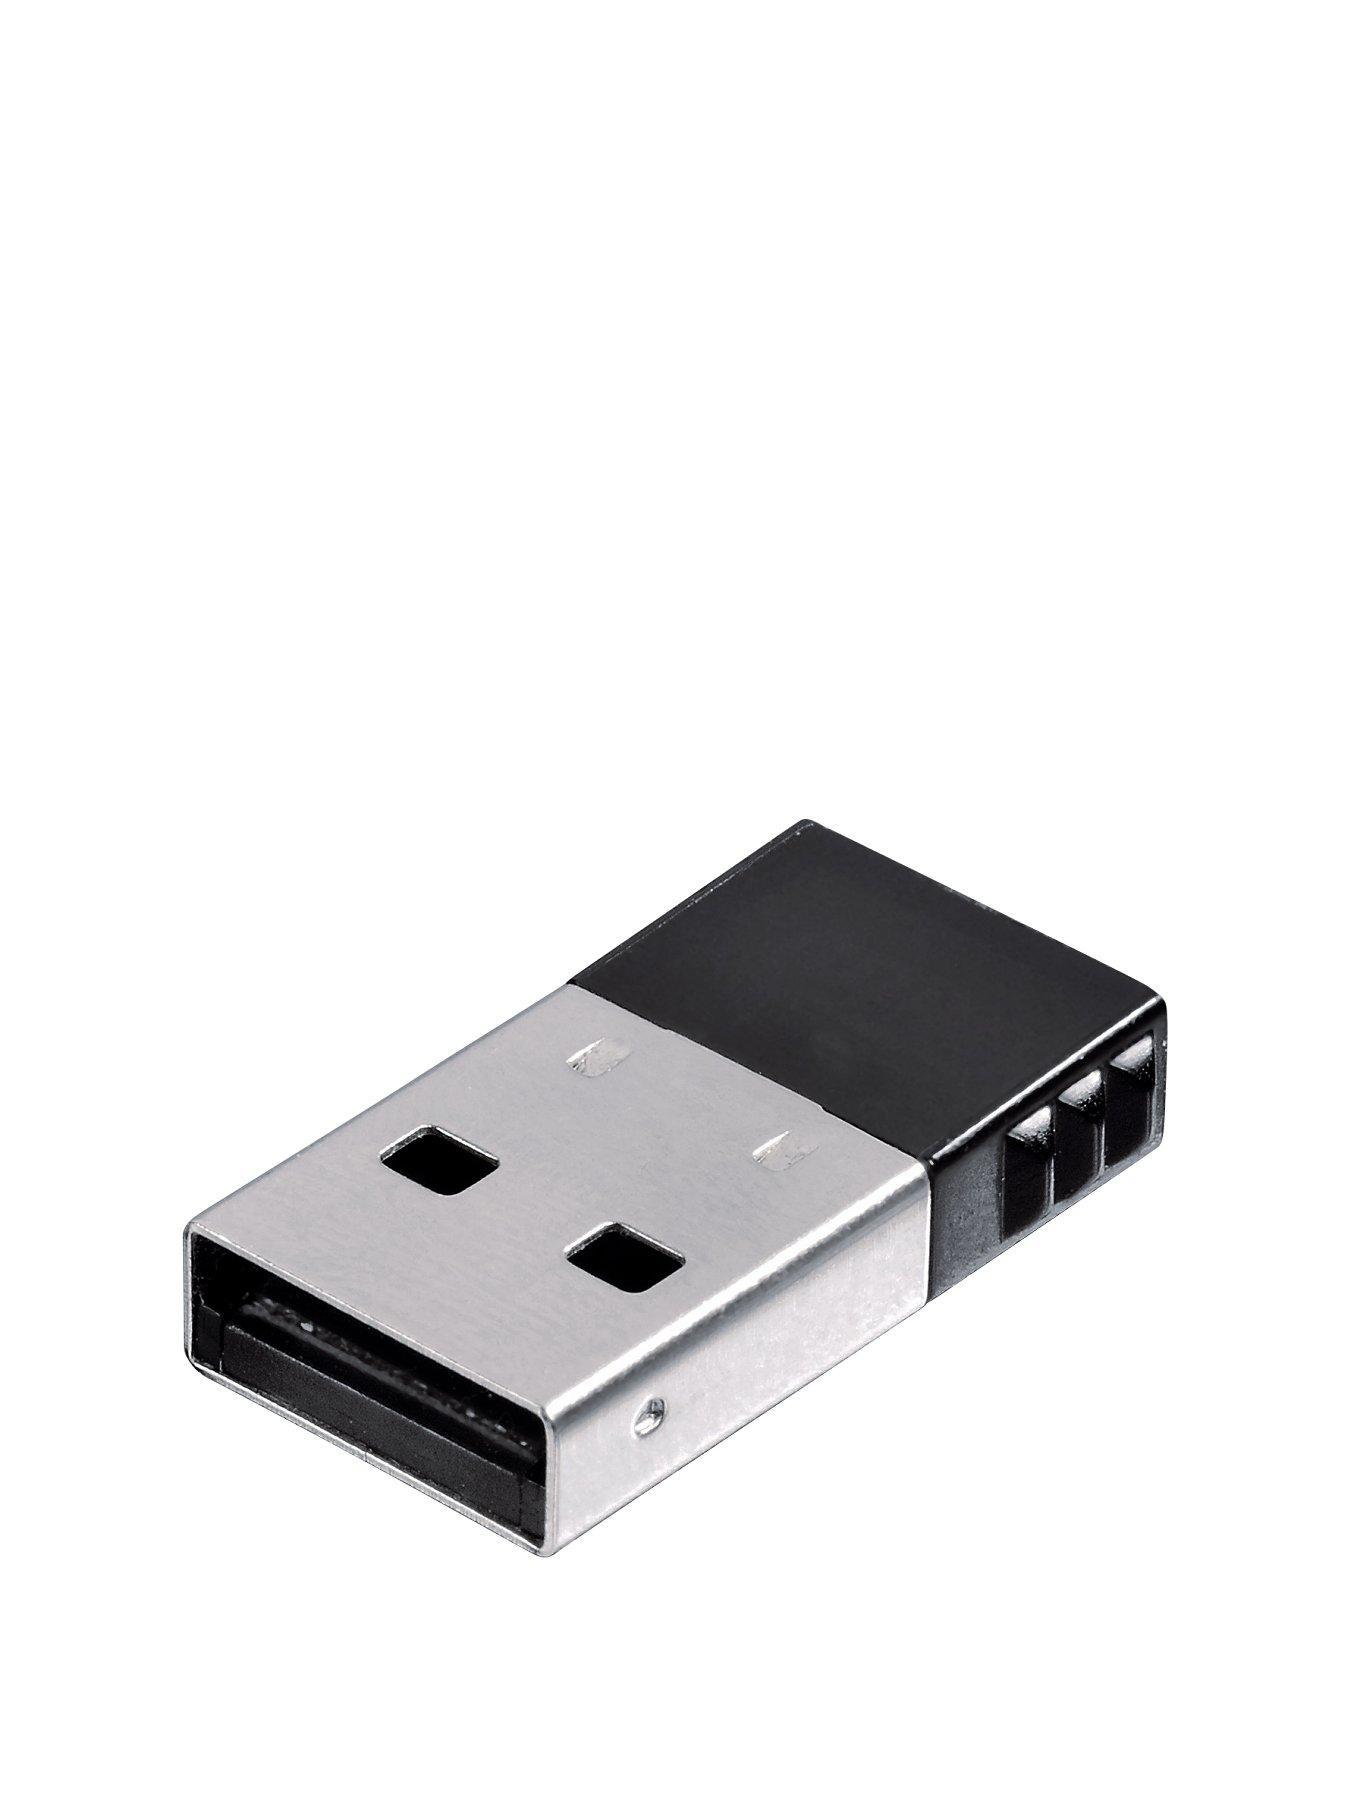 Class 1 Nano Bluetooth USB Adaptor, 3.0+EDR